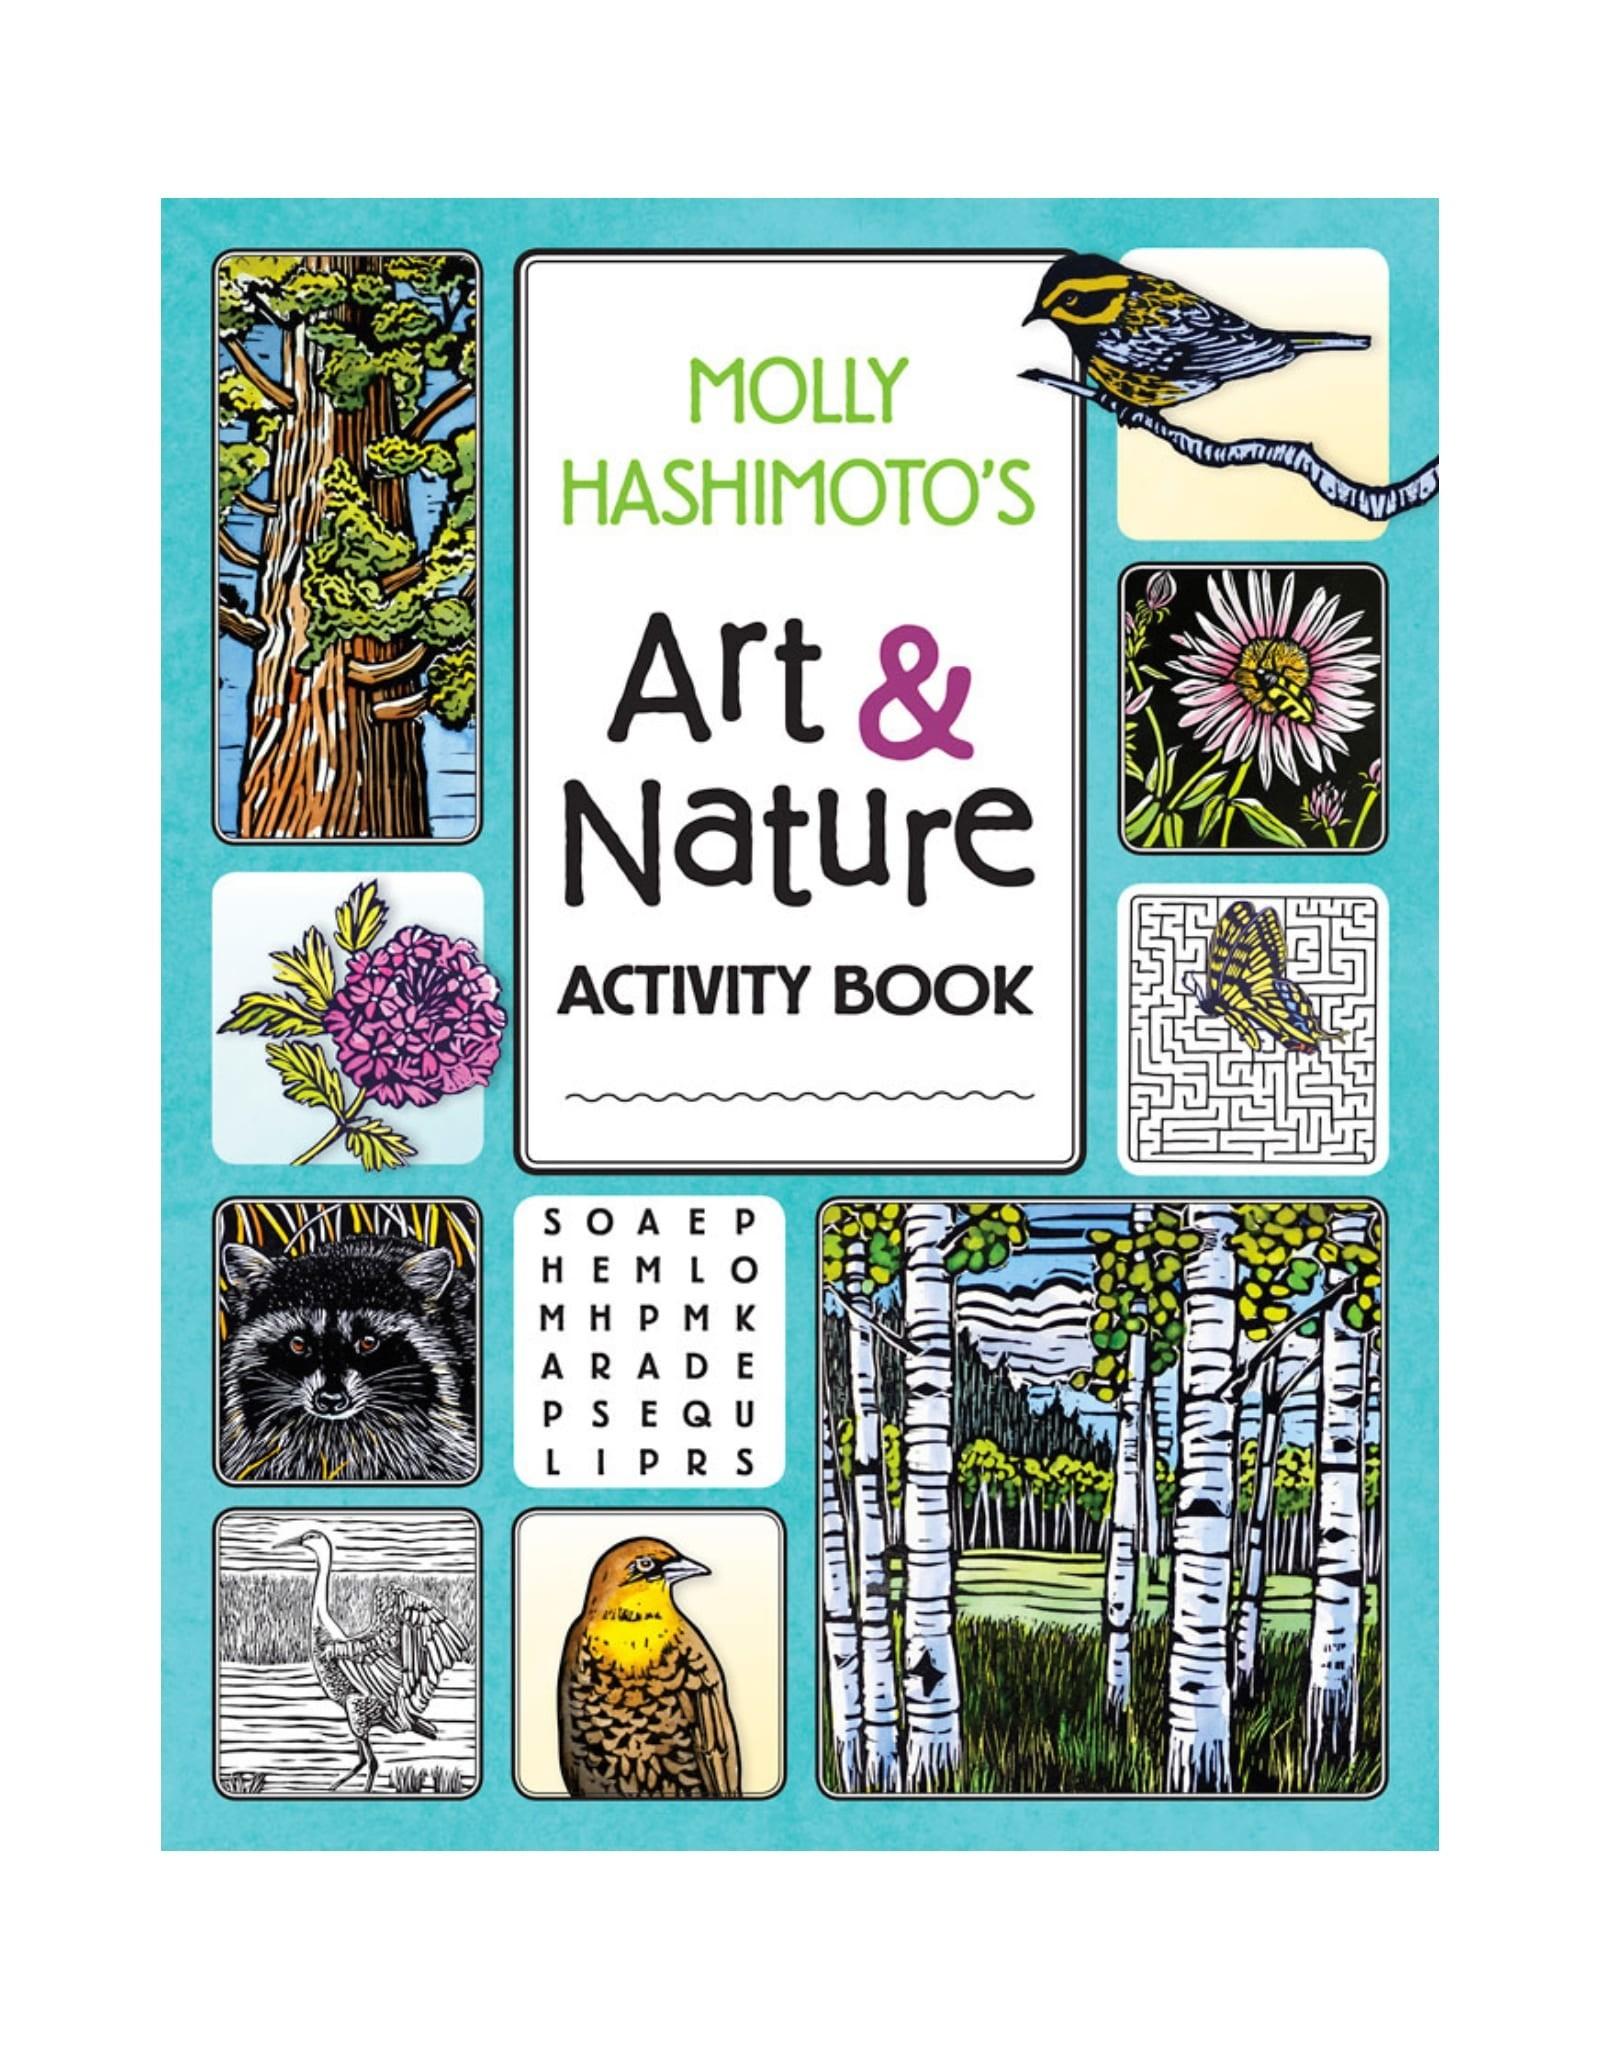 Activity Book Molly Hashimoto's Art & Nature